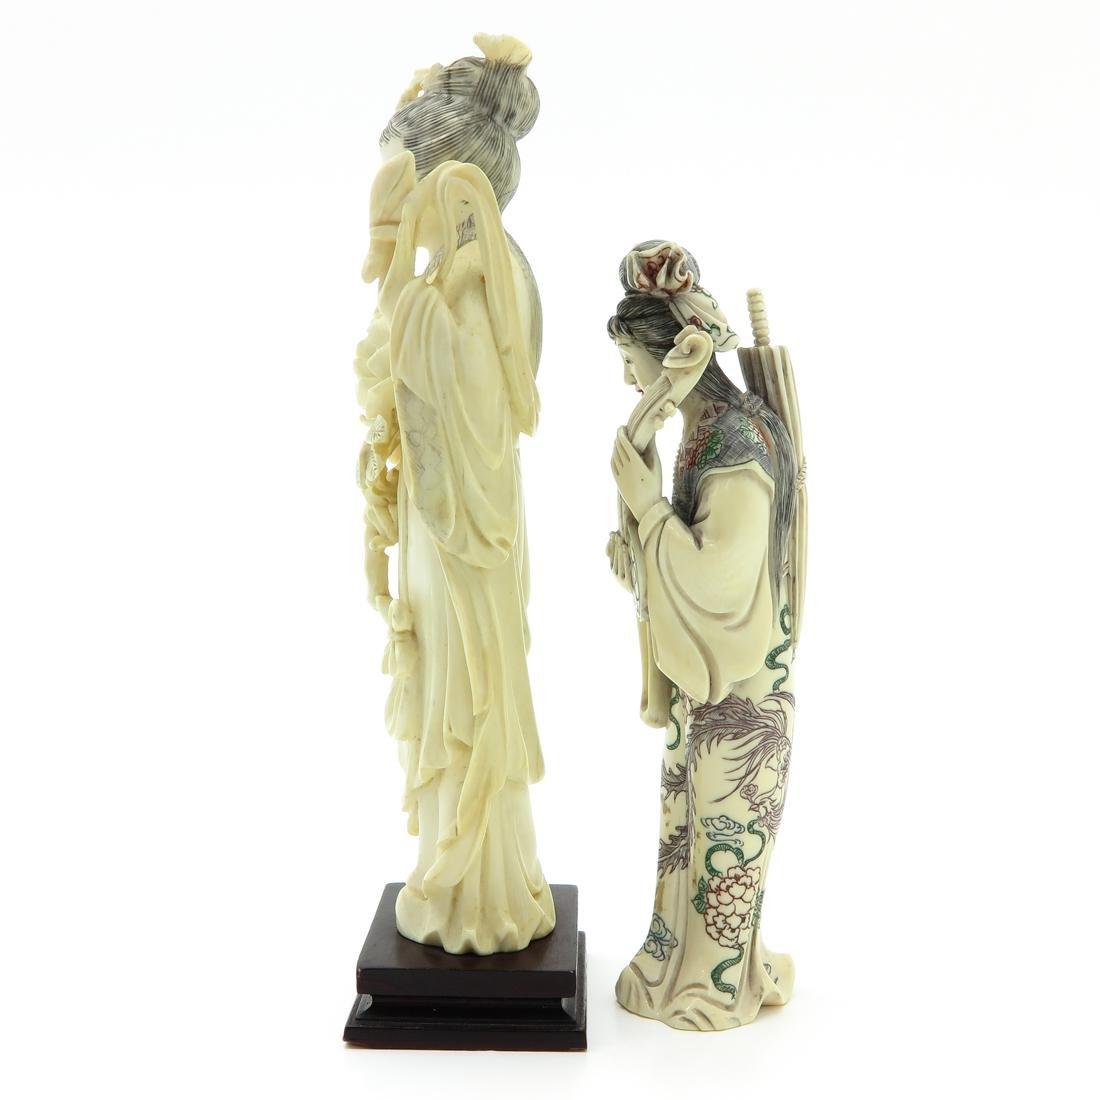 Lot of 2 Carved Sculptures - 2